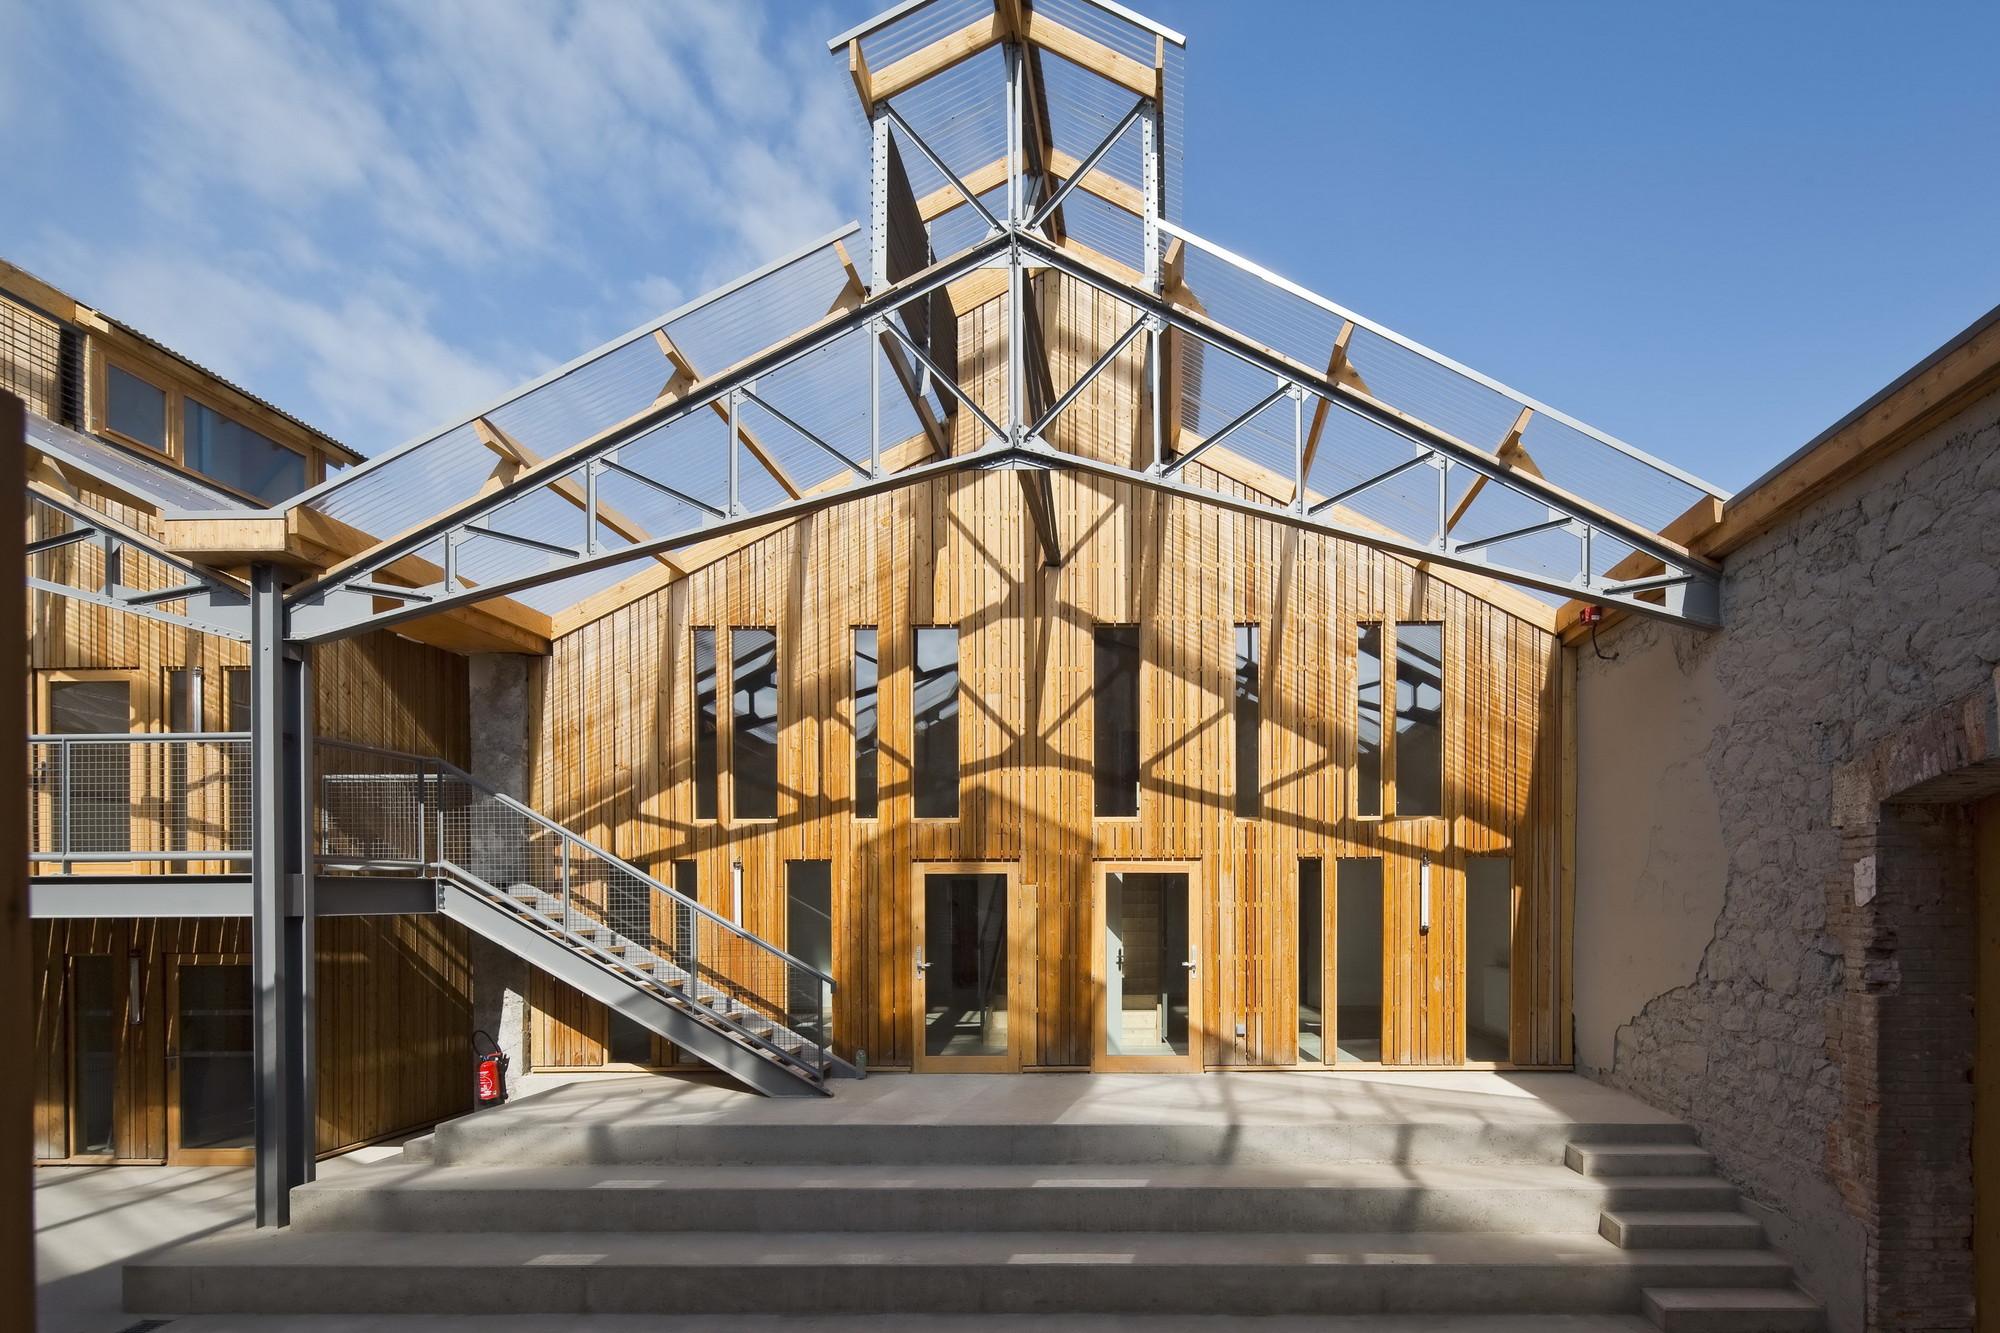 Conservatorio de artes circenses / ADH Architects, © Hervé Abbadie